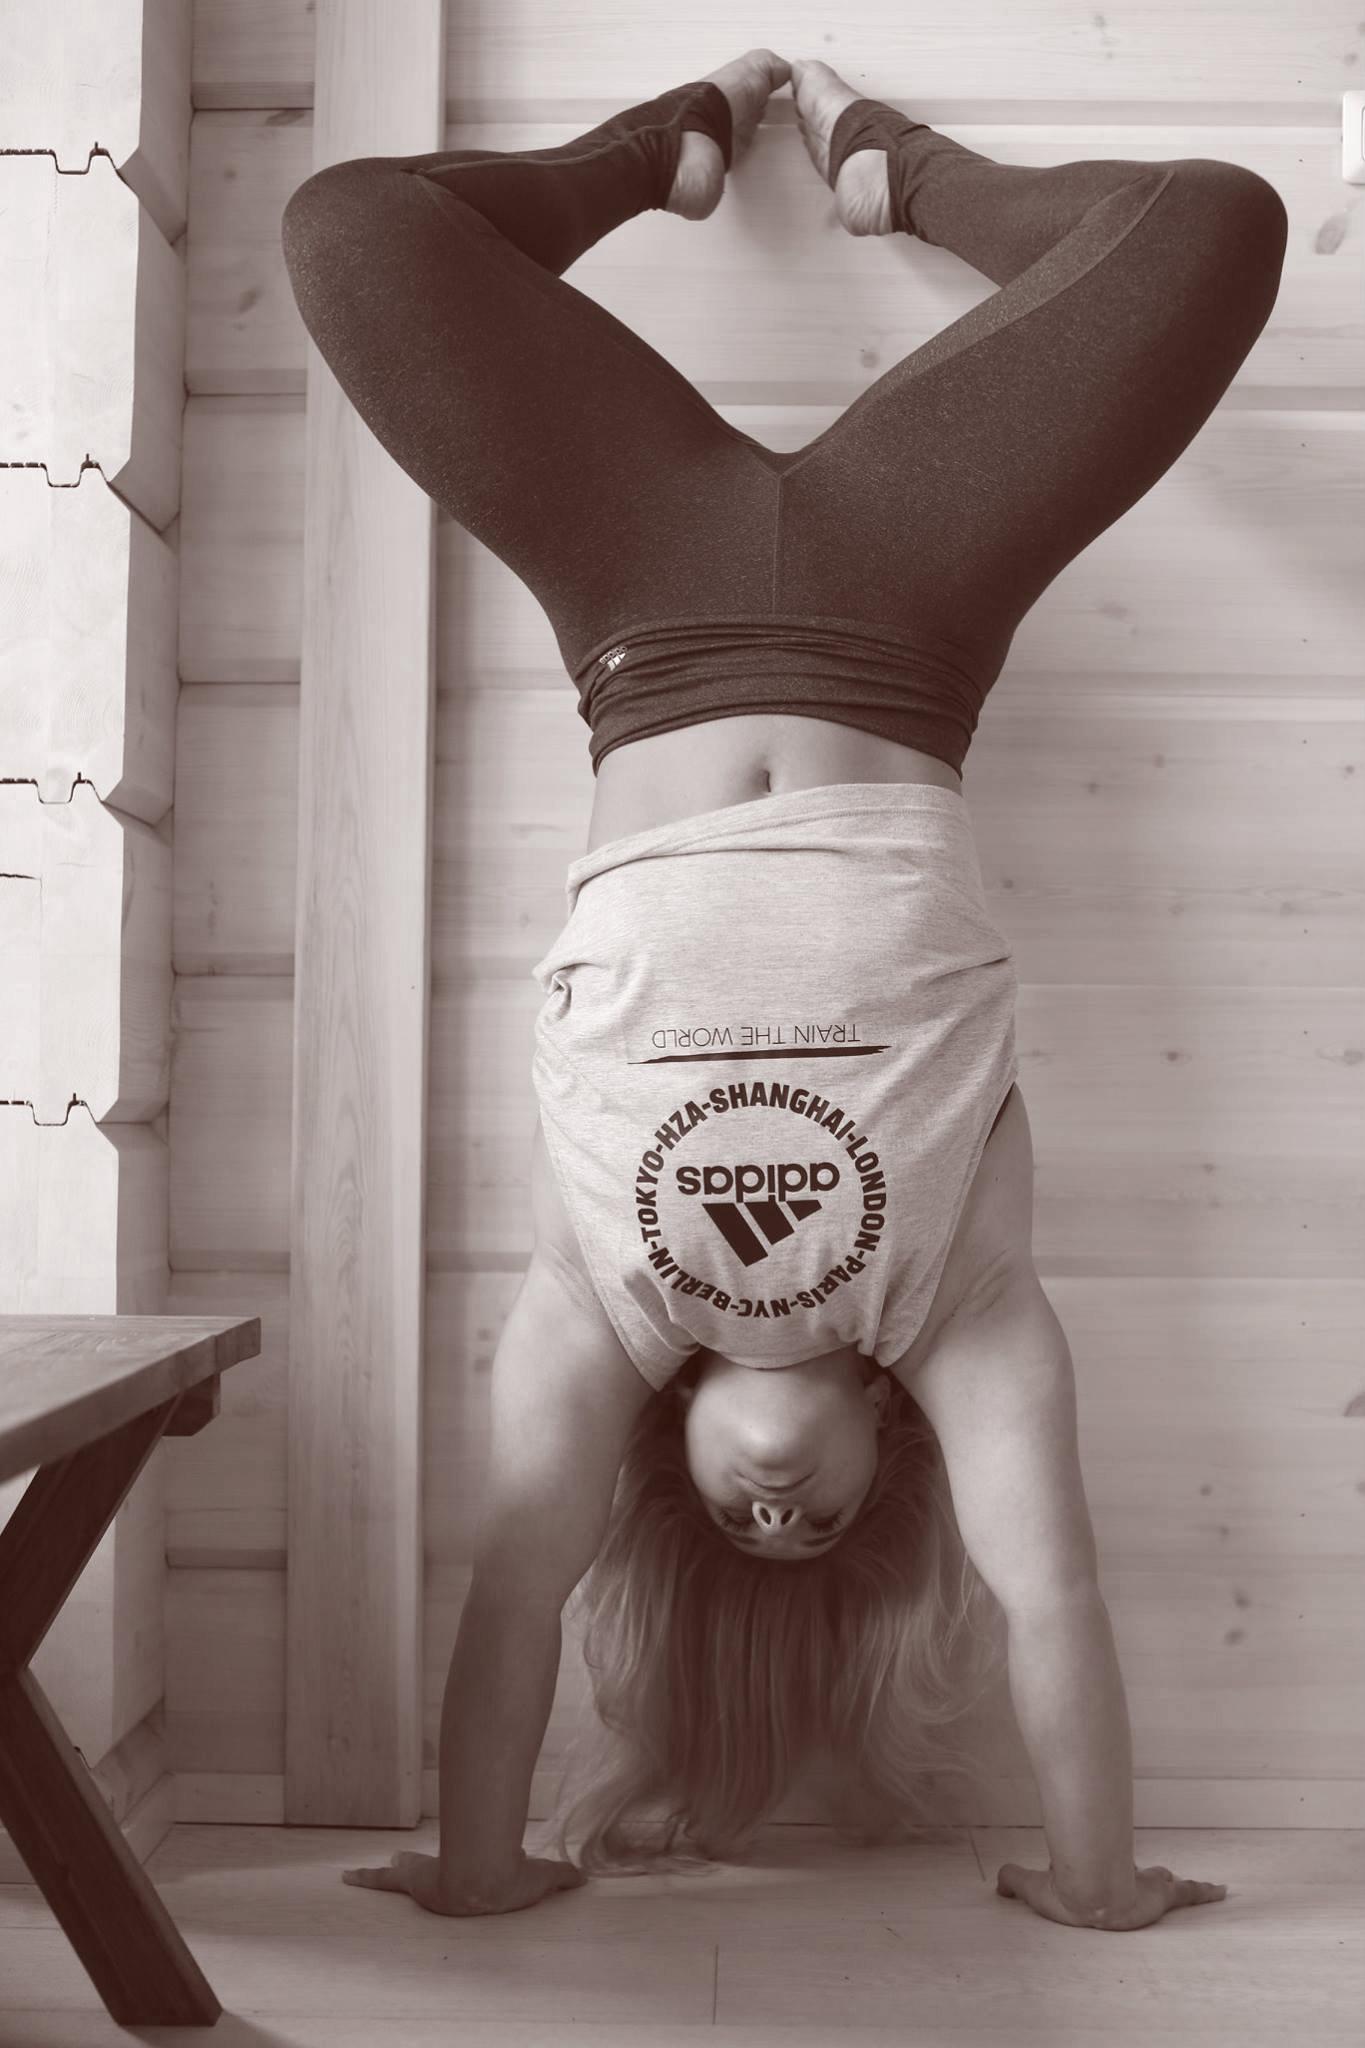 eveliina_handstand